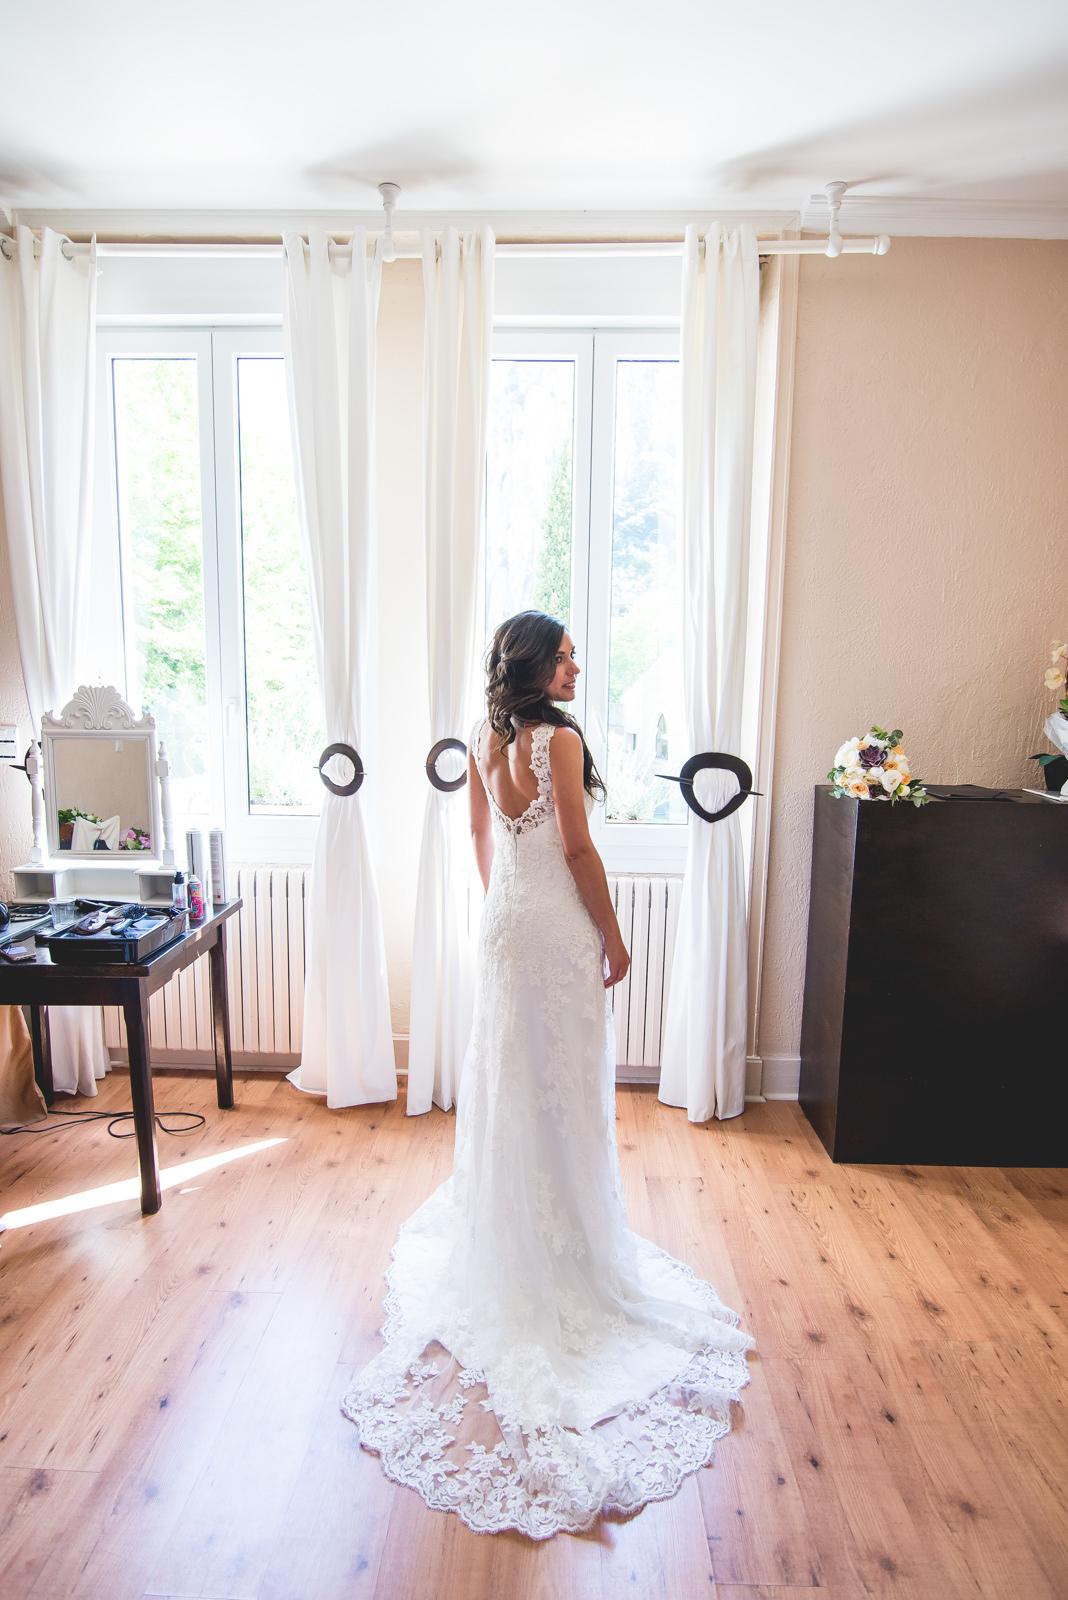 Mariage Auberge Du Parc Orgon Jai 2 Amours Wedding Planner Provence